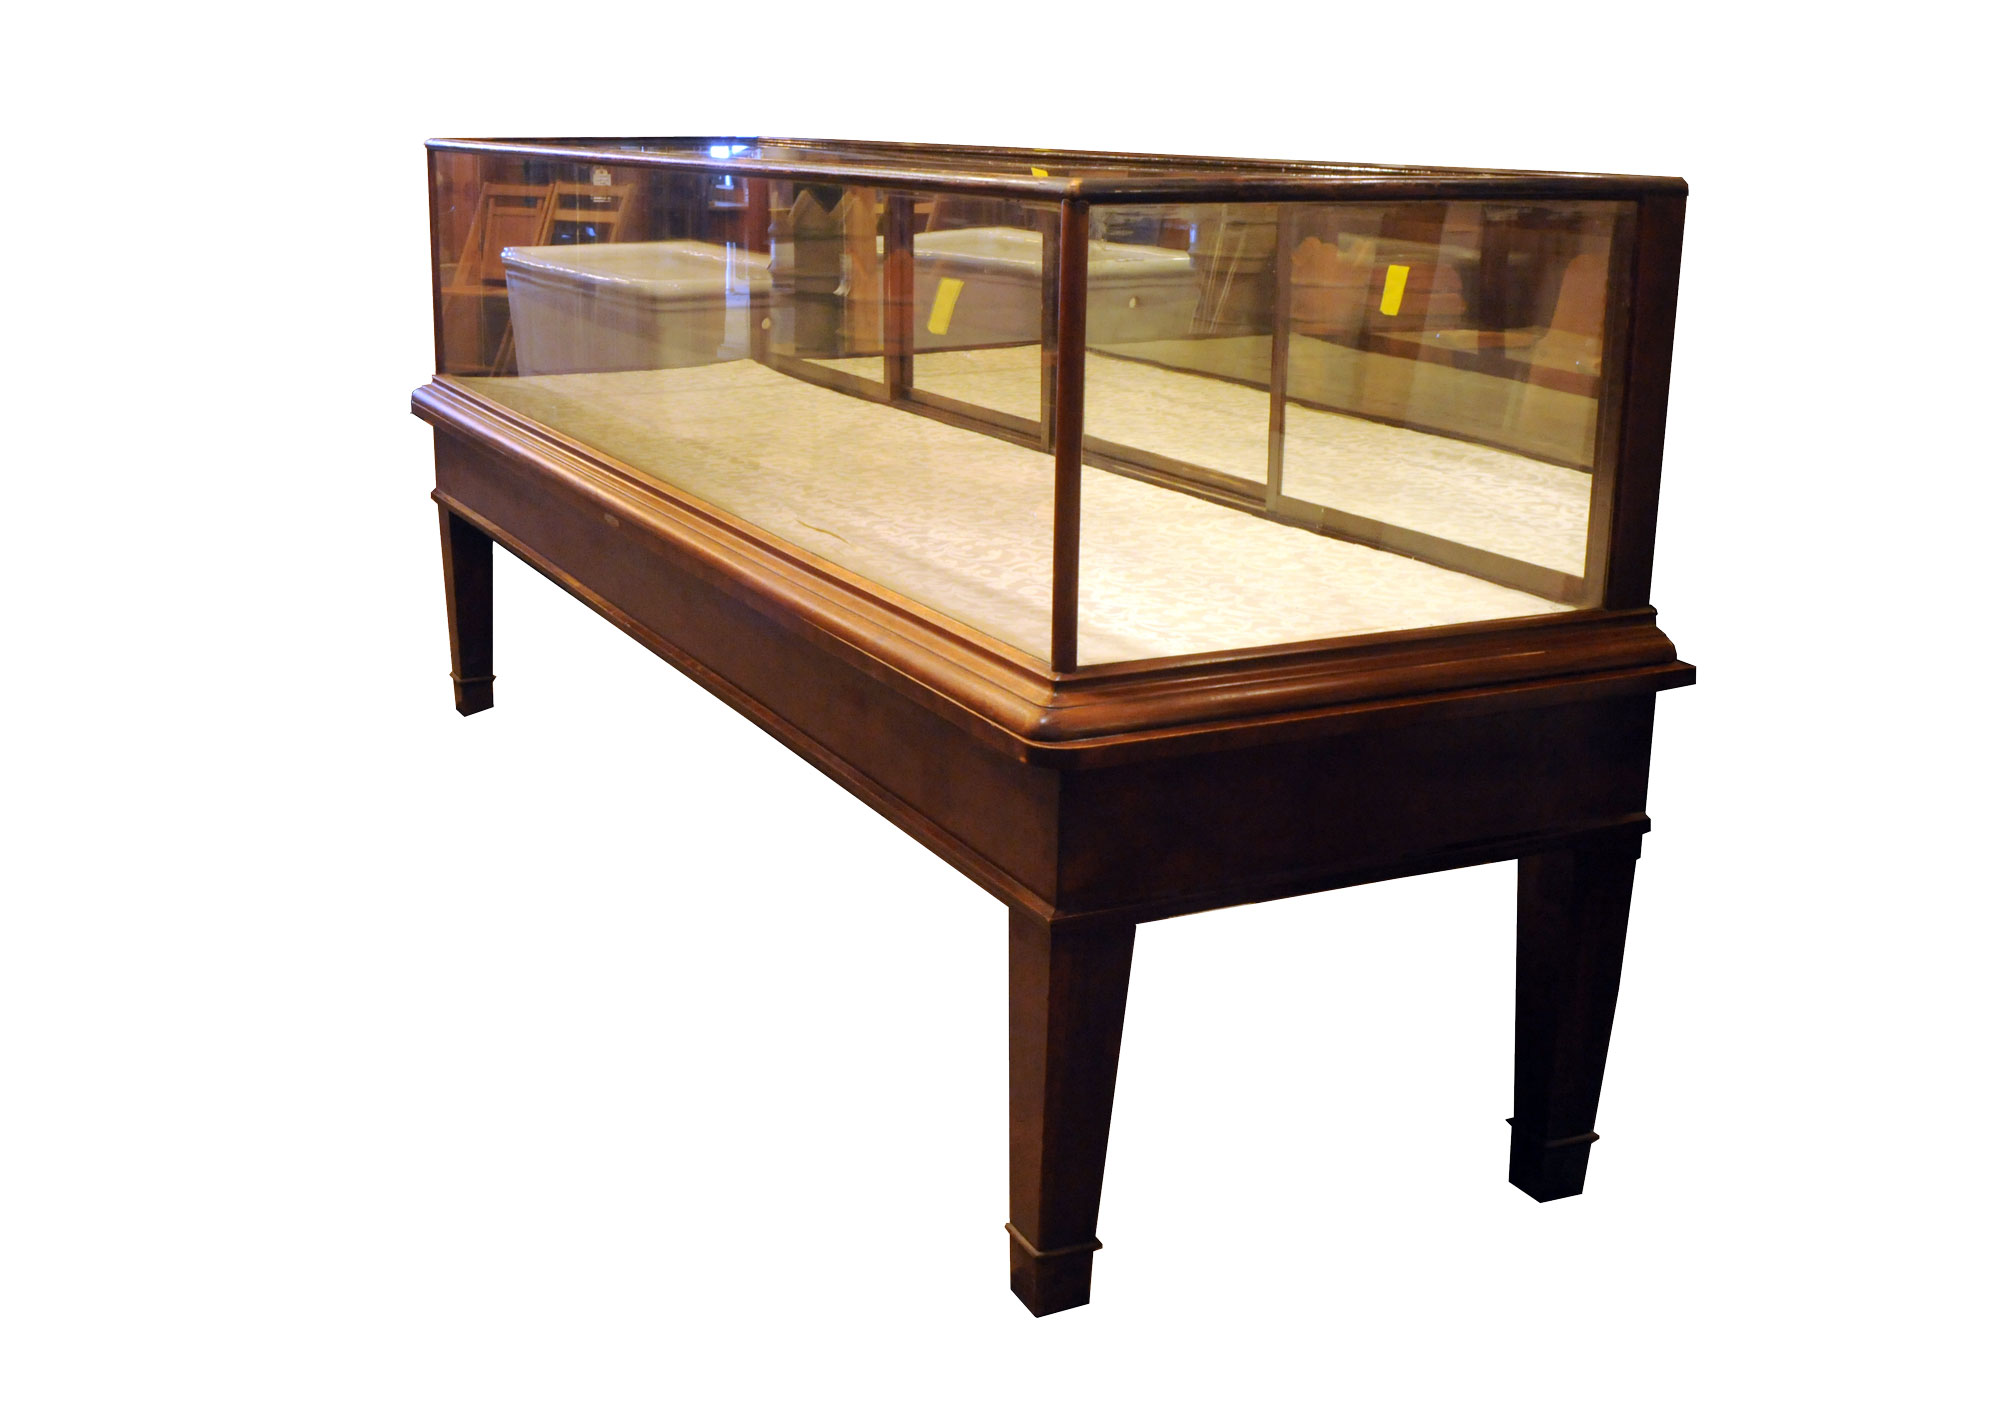 46838-oak-display-cabinet-front-angle.jpg